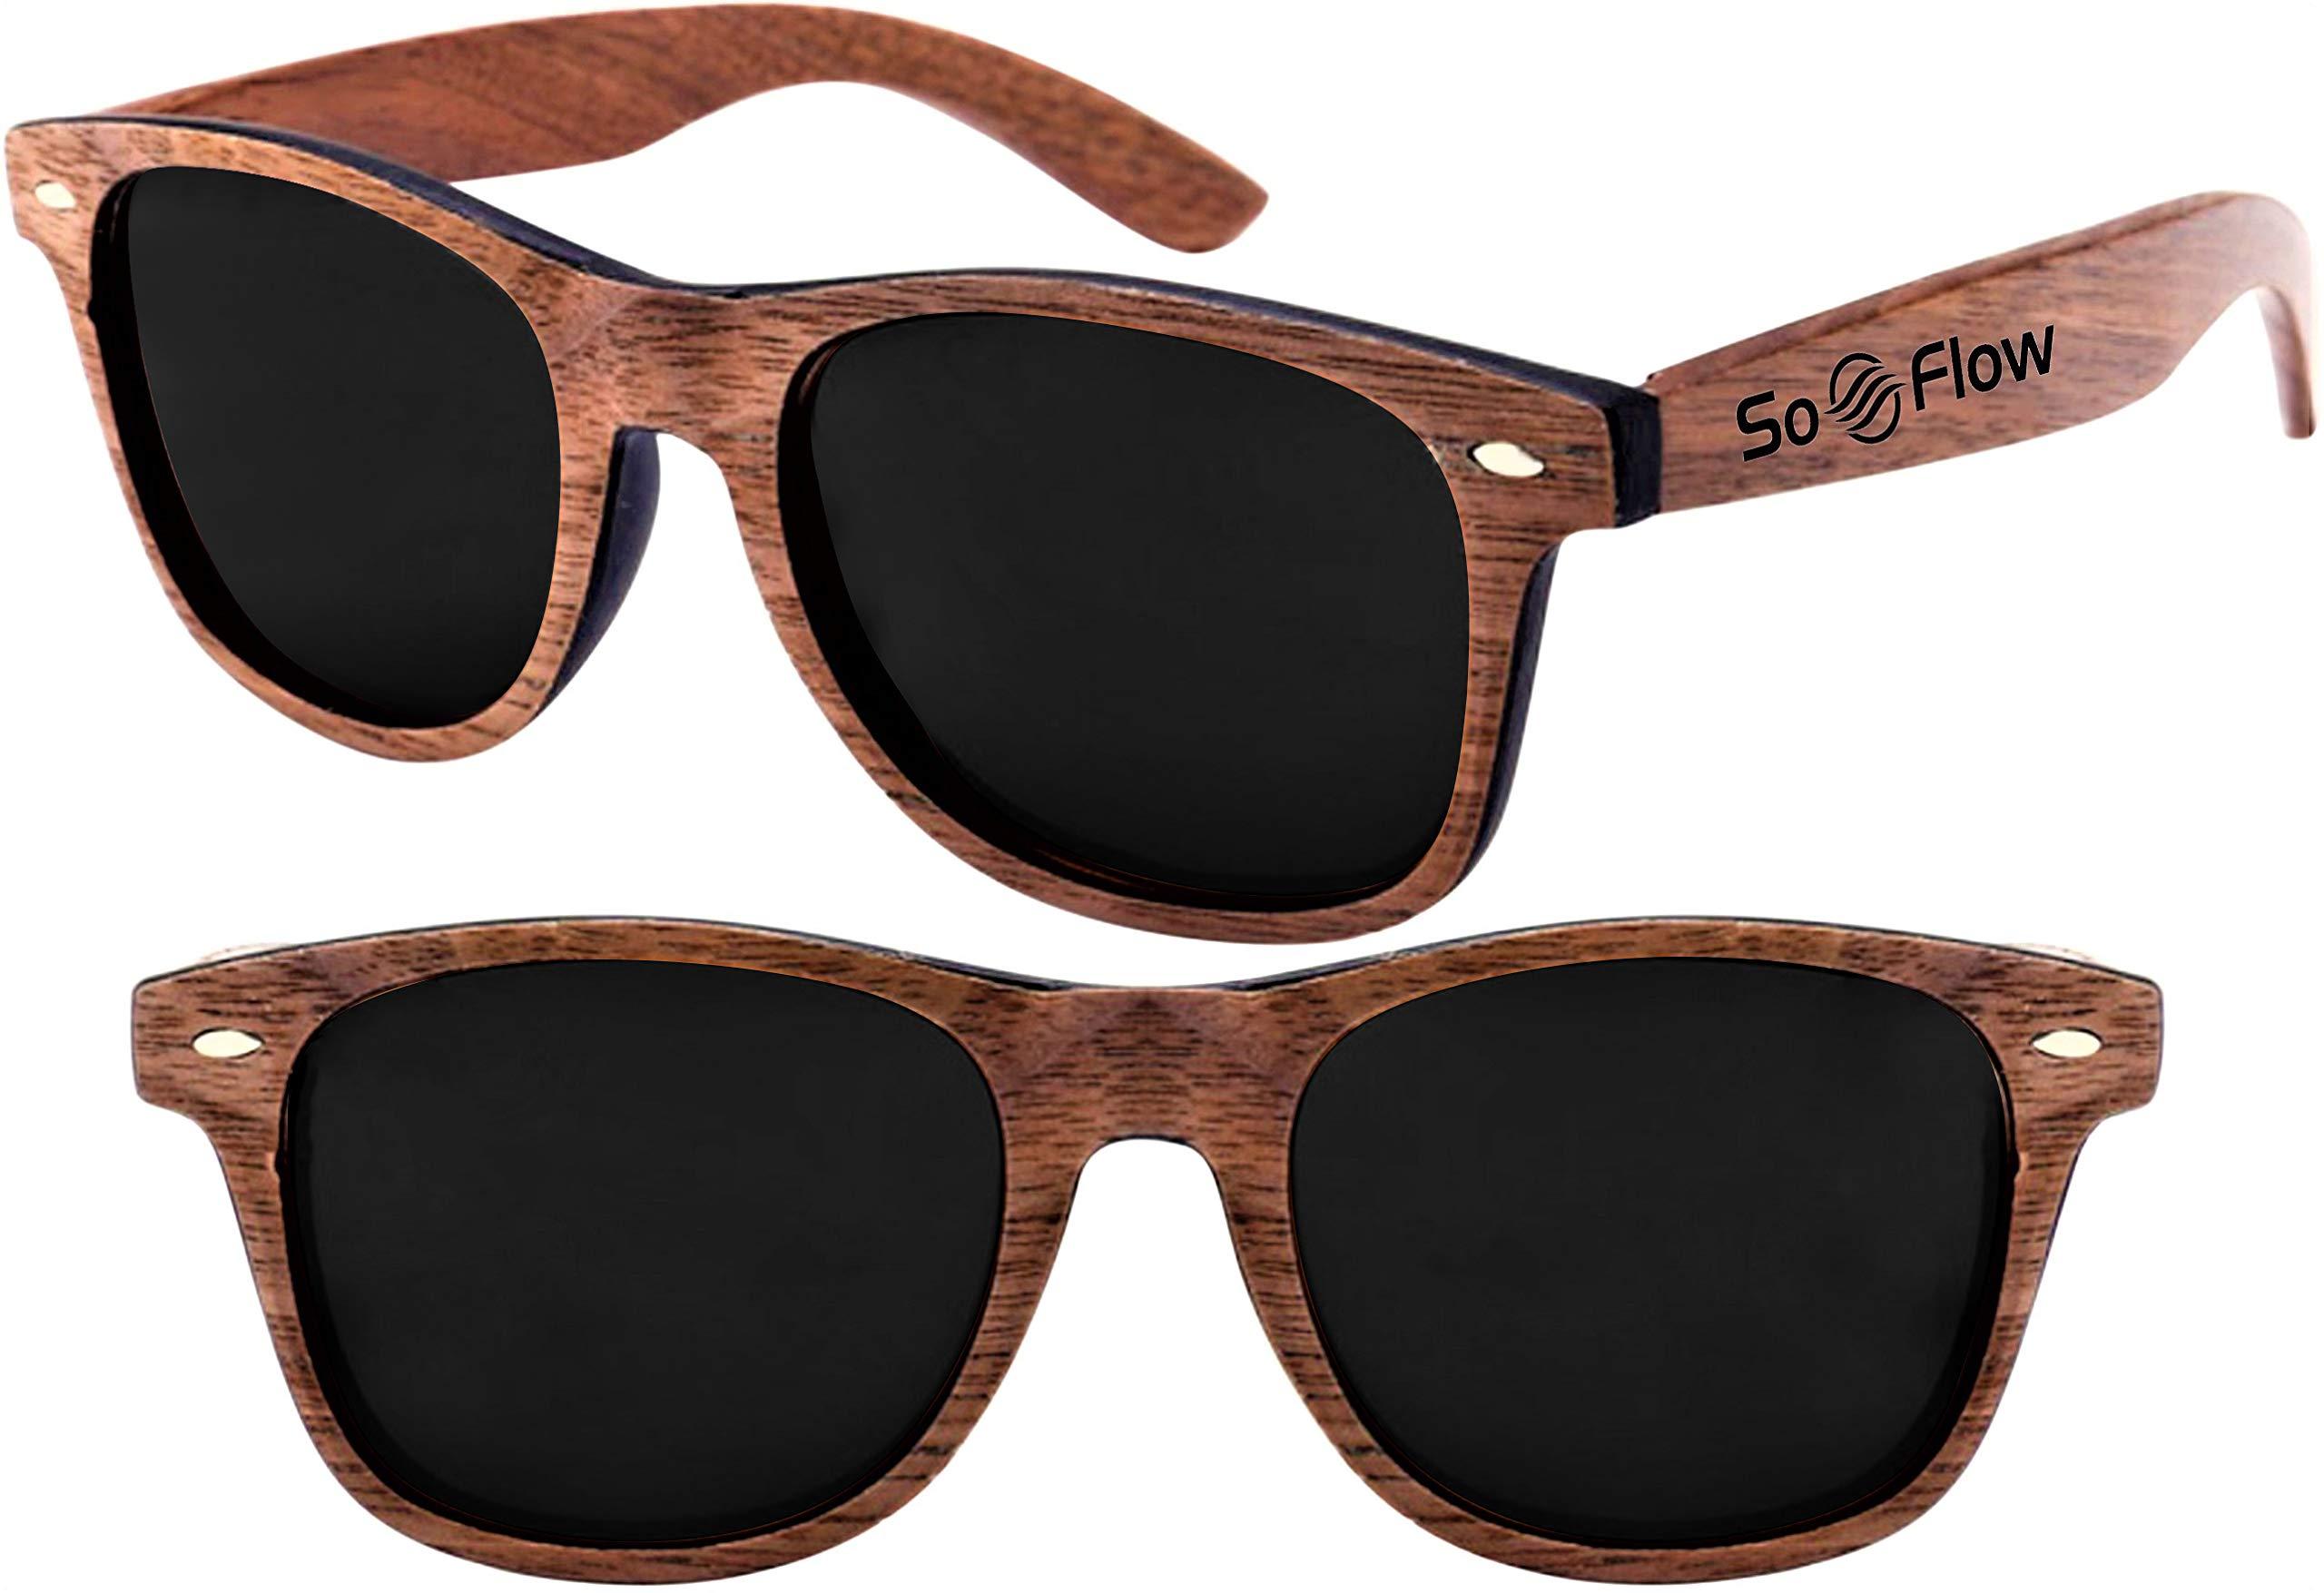 ffc13ed993 Polarized Walnut Wood Wayfarer Sunglasses Men Women Wooden Mirrored Lens  UV-400 (Black)